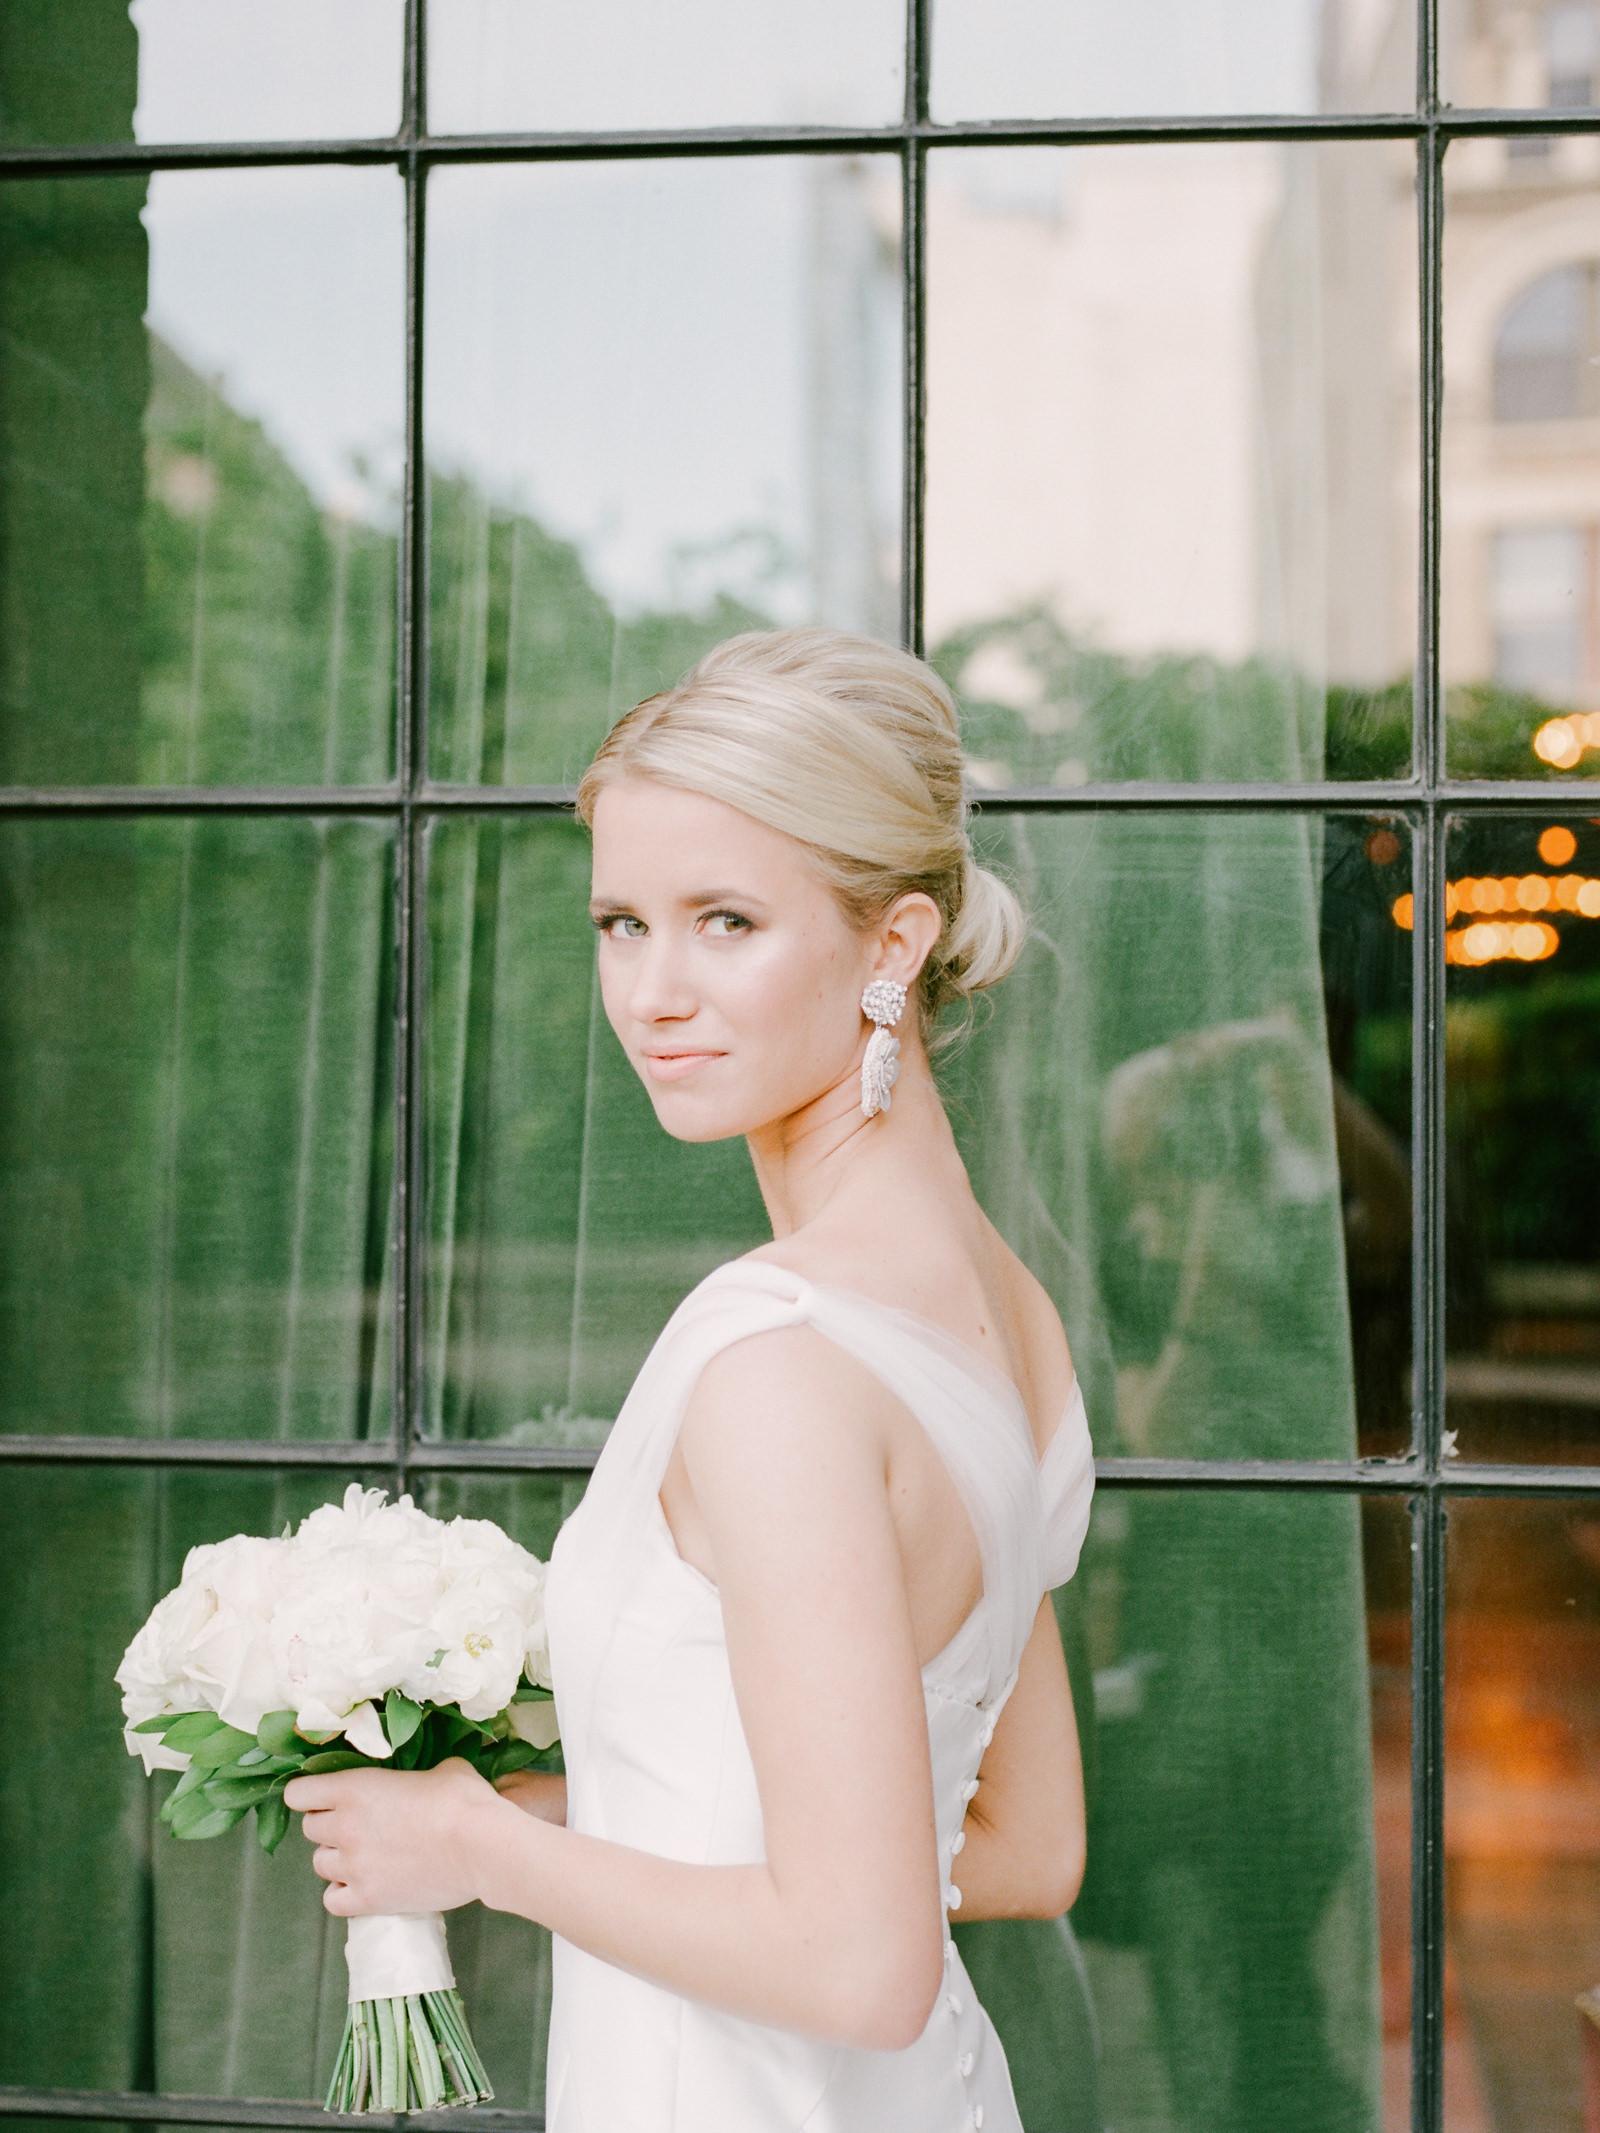 Intimate-NYC_wedding_ by Tanya Isaeva-77.jpg